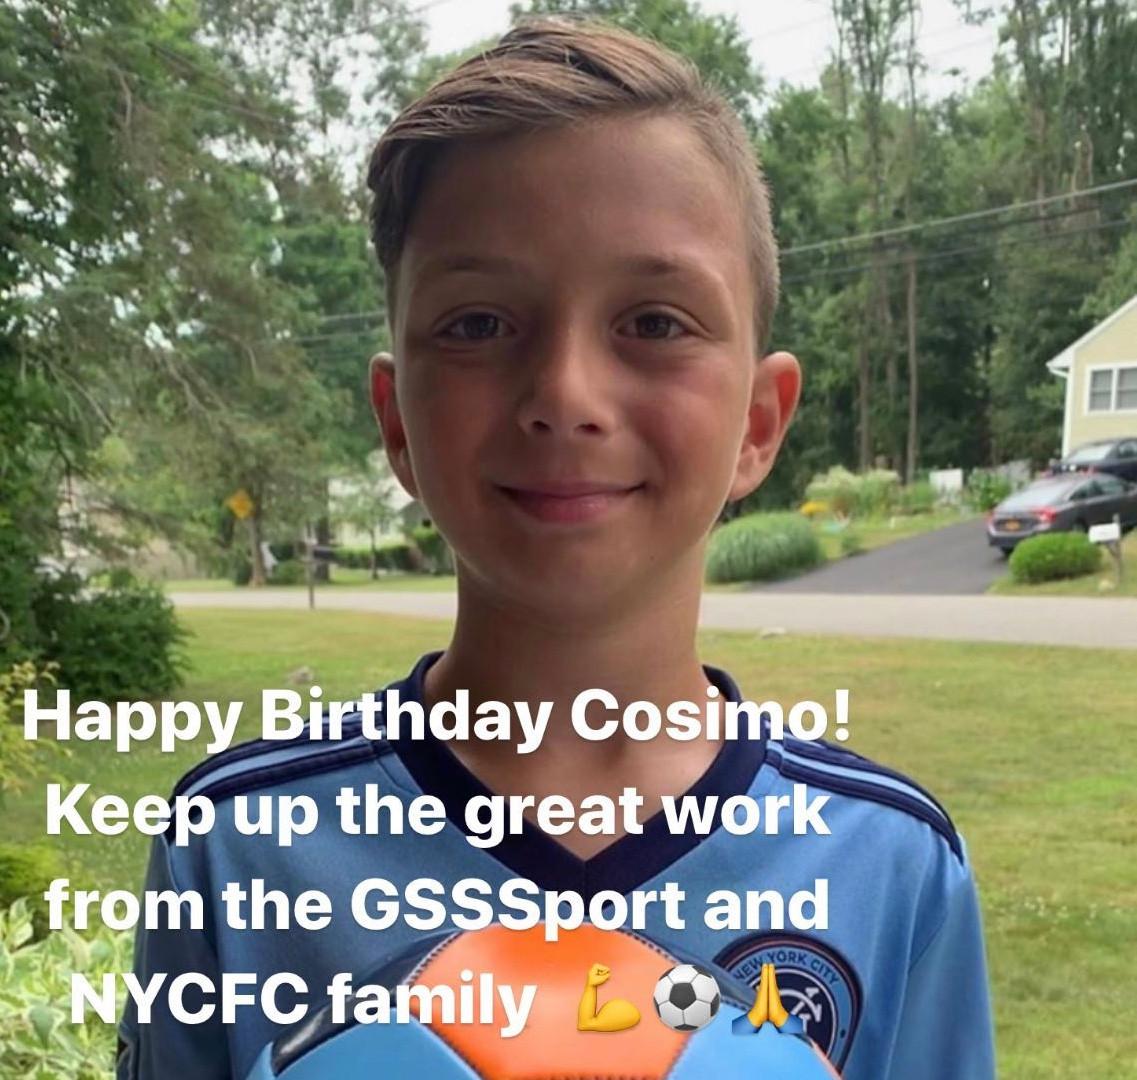 Cosimos Birthday Present from NYCFC Players